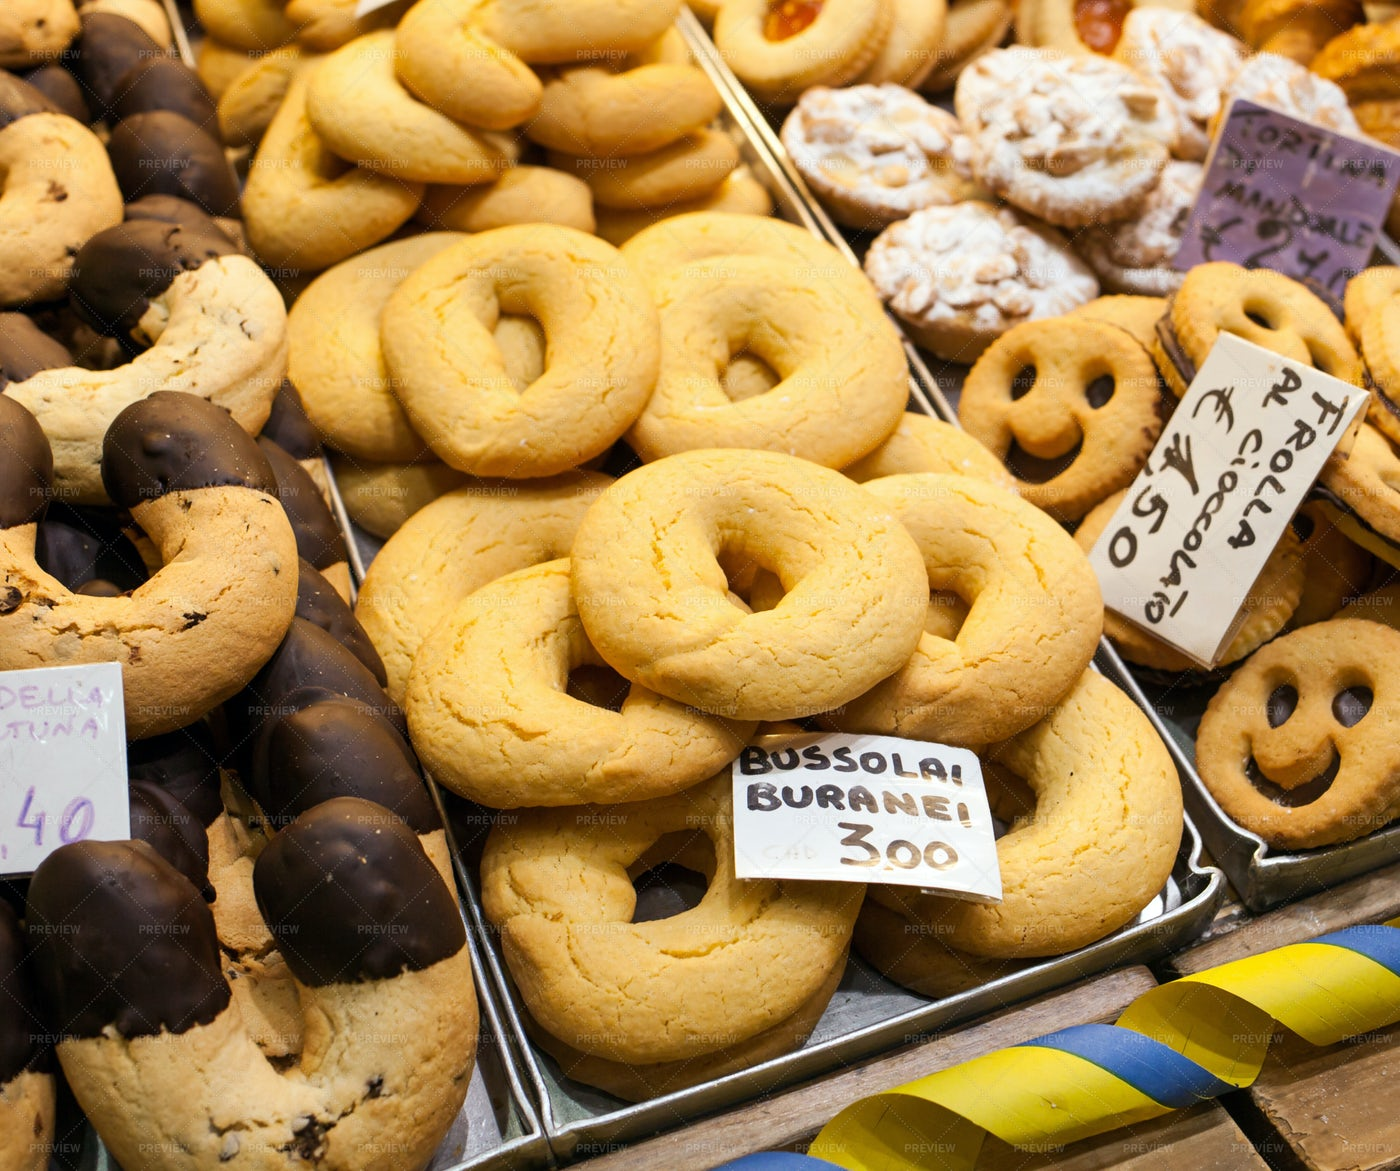 Bussolai Cookies On Display: Stock Photos